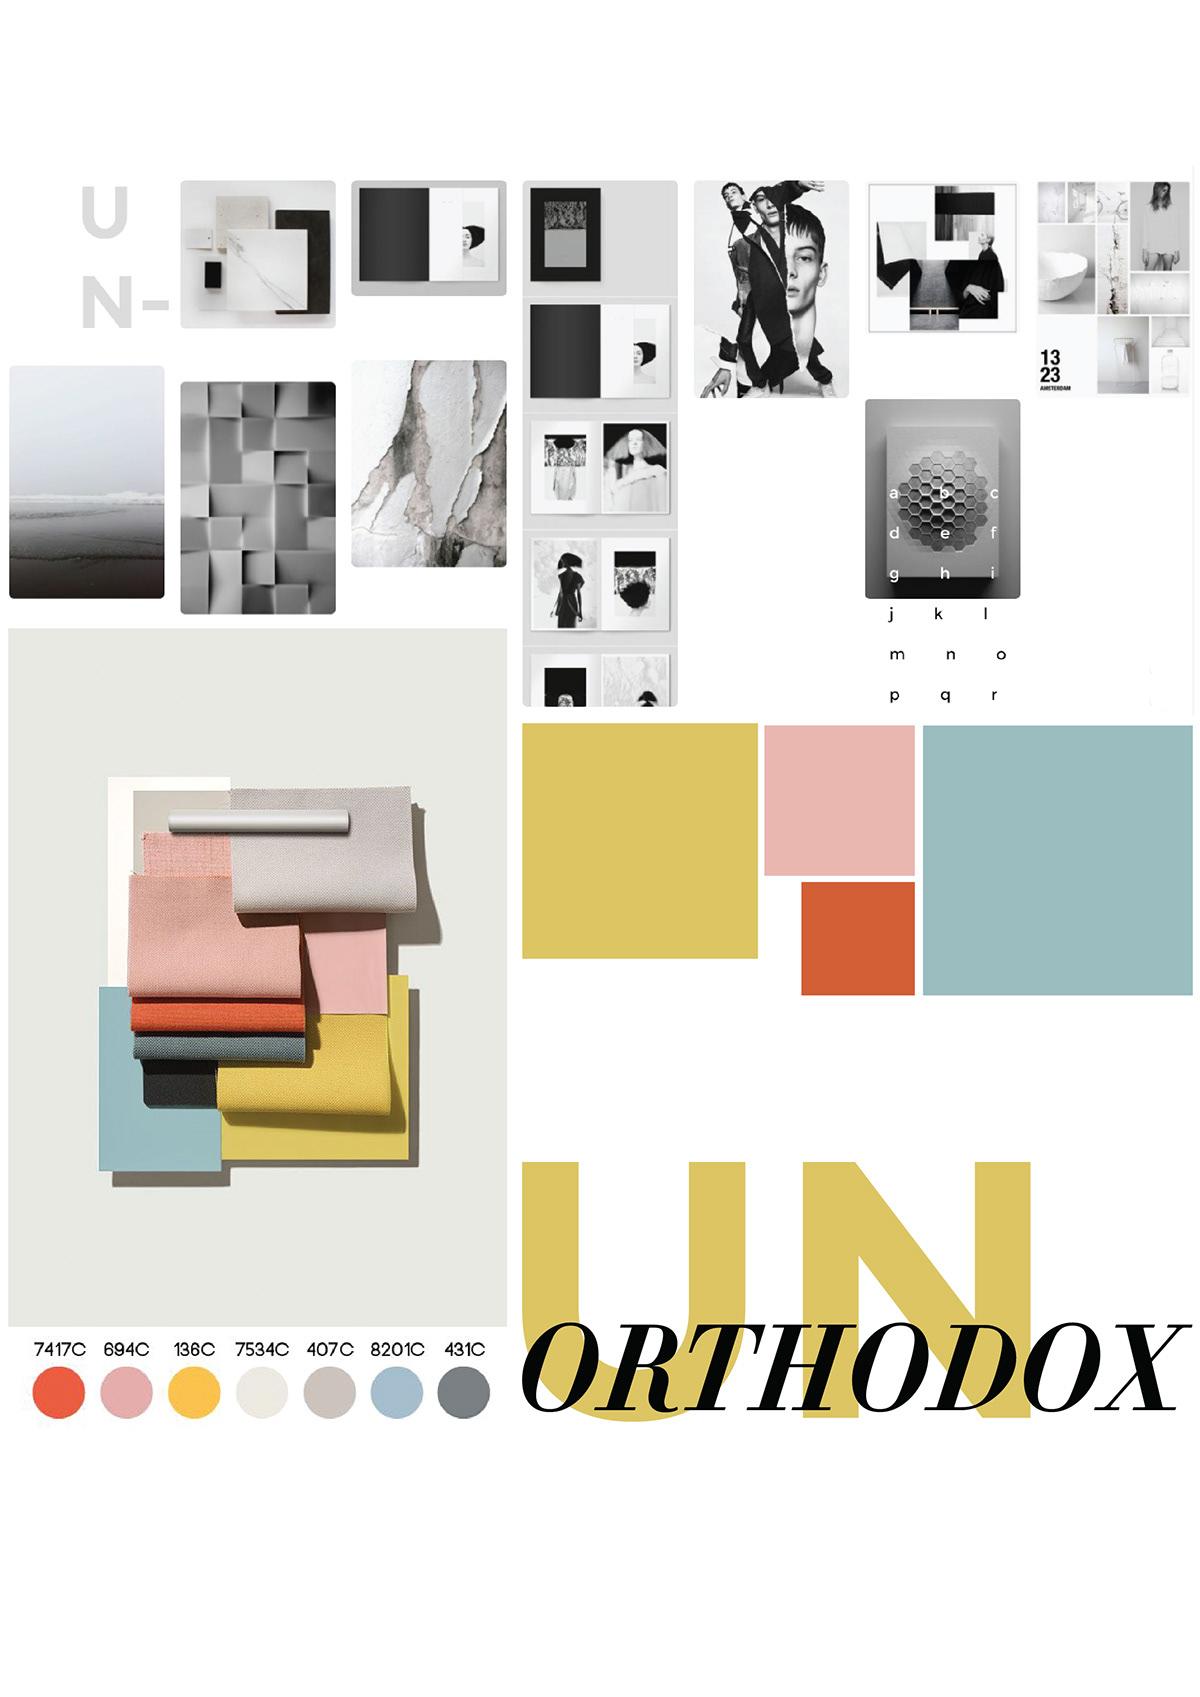 UNORTHODOX- IDENTITY DESIGN on Behance